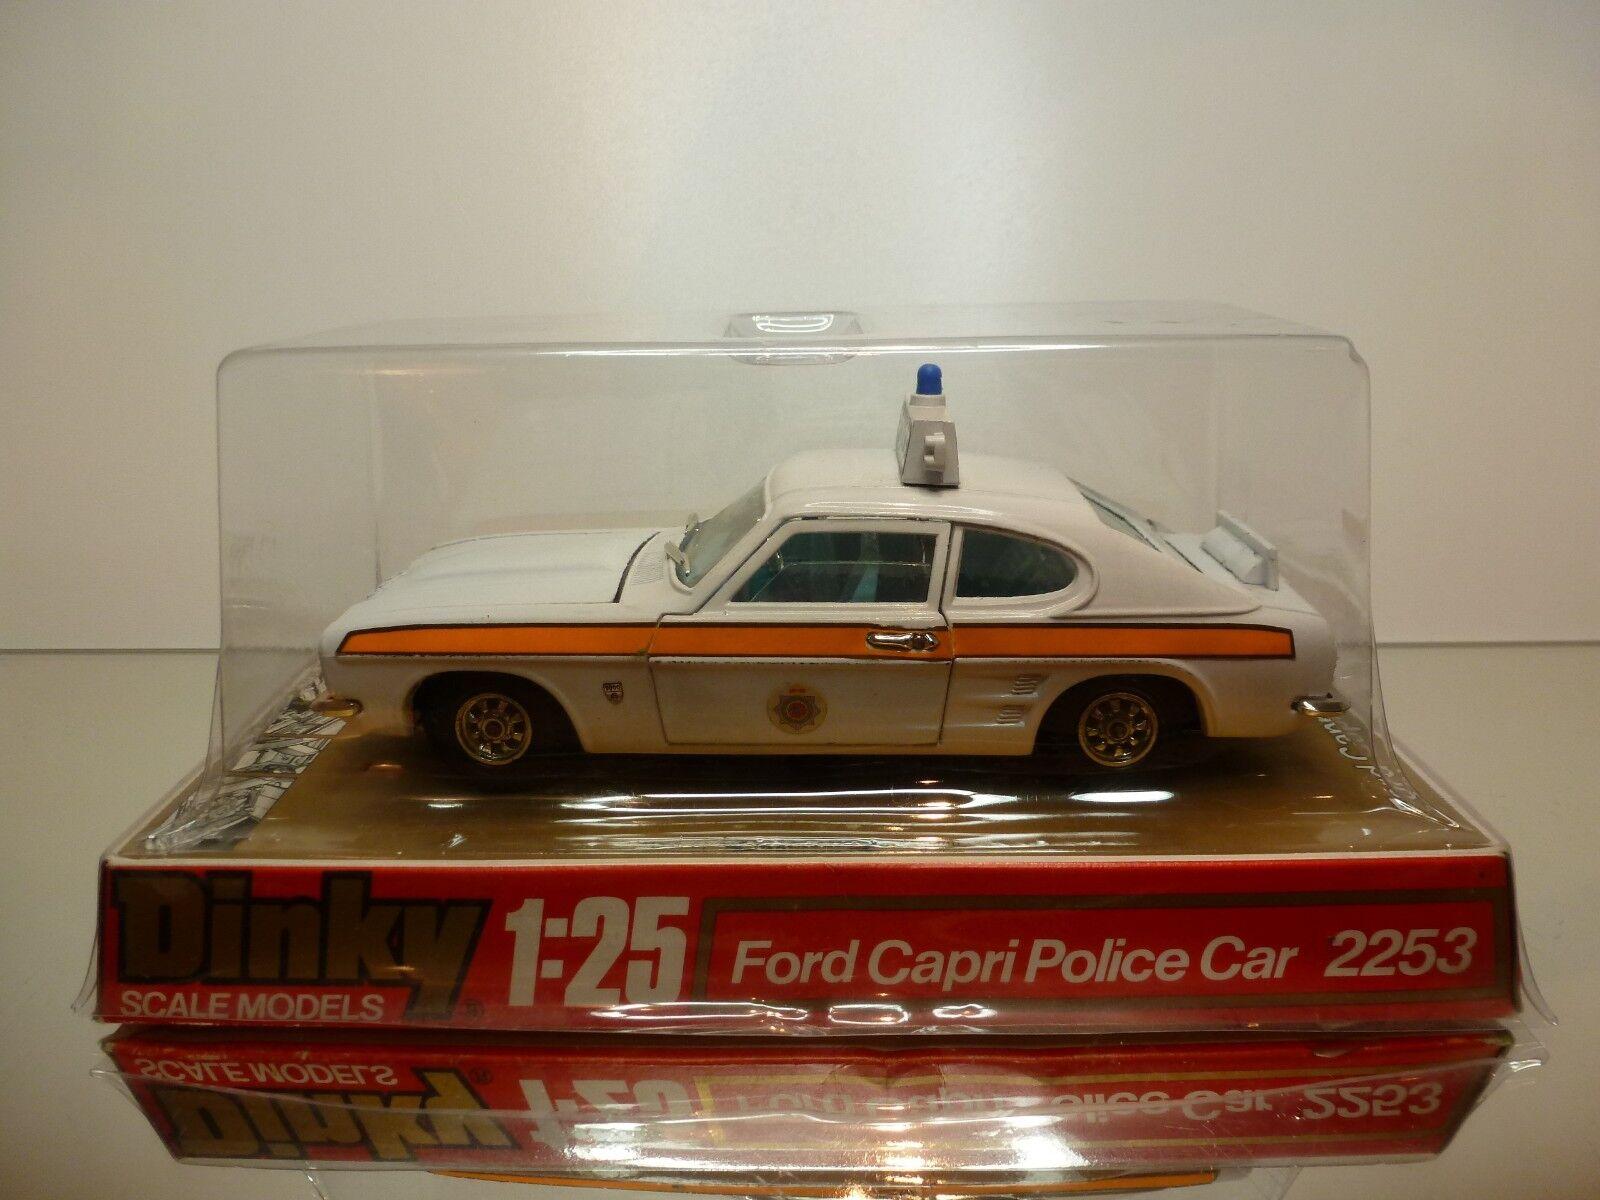 DINKY TOYS  2253 FORD CAPRI GXL - RHD POLICE CAR  - WHITE 1 25 - GOOD IN BLISTER